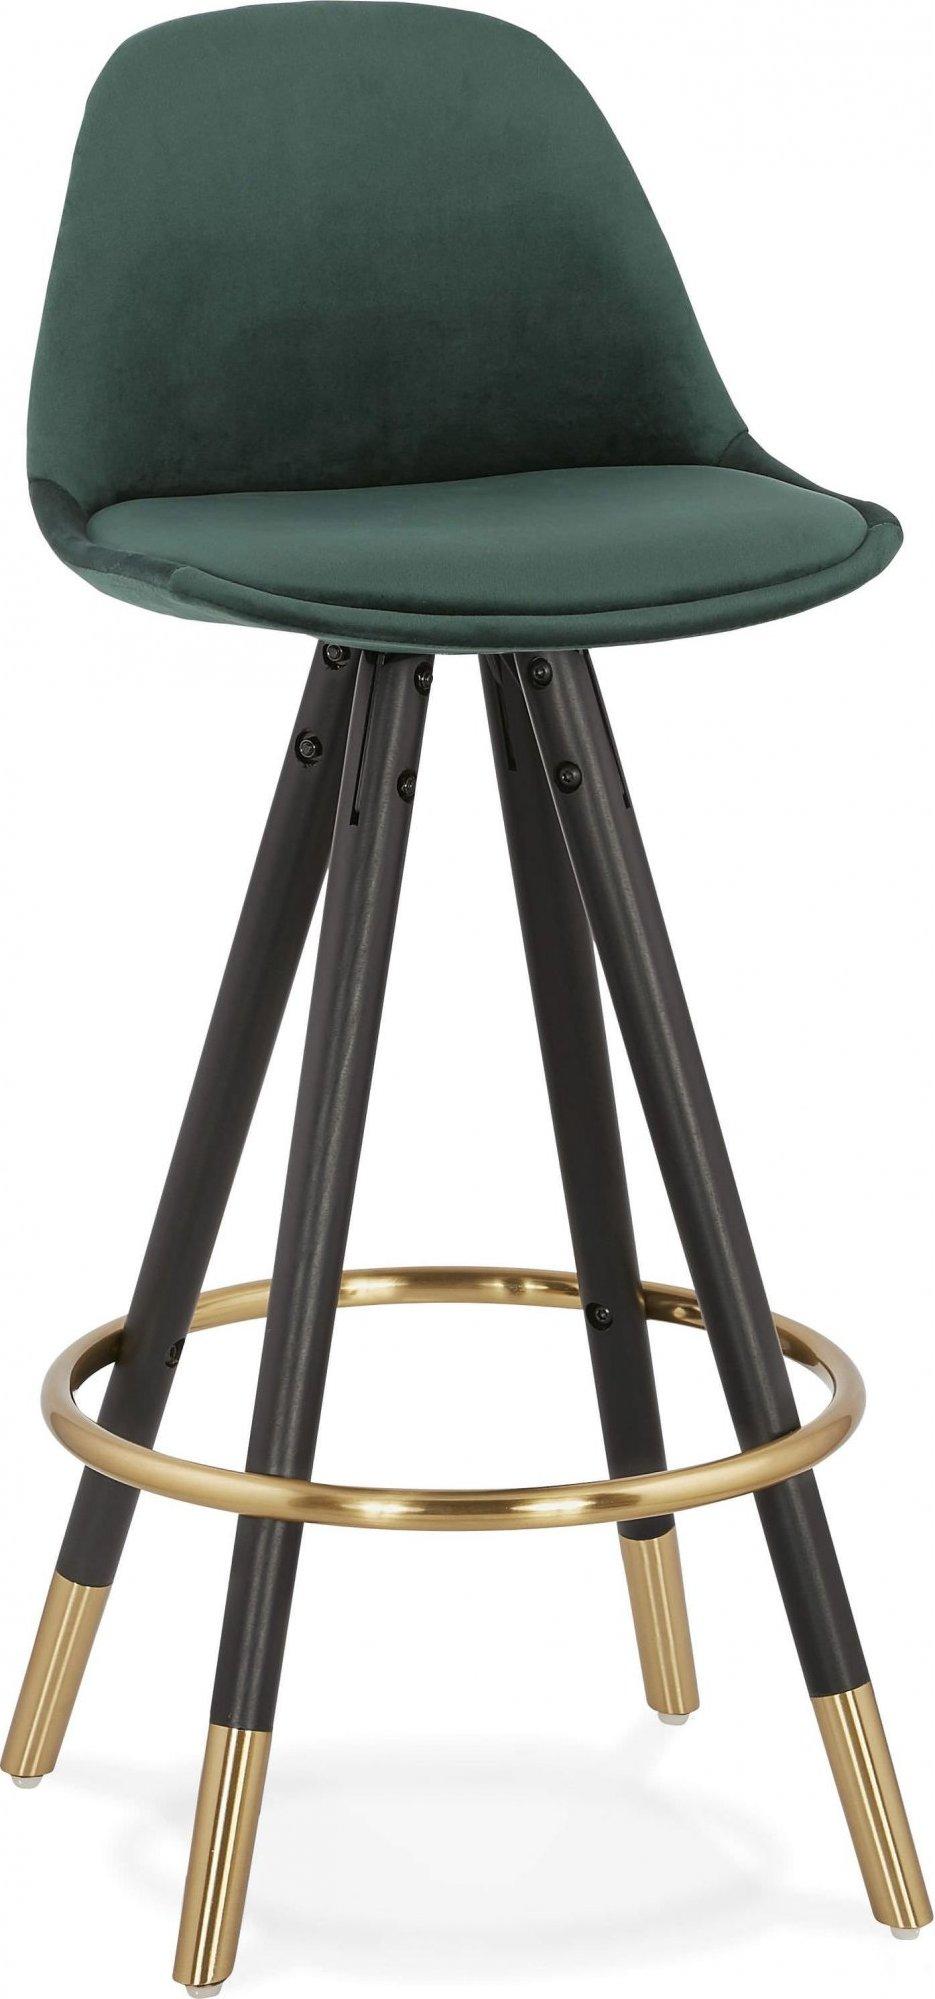 Tabouret de bar design bois noir et velours vert h87cm